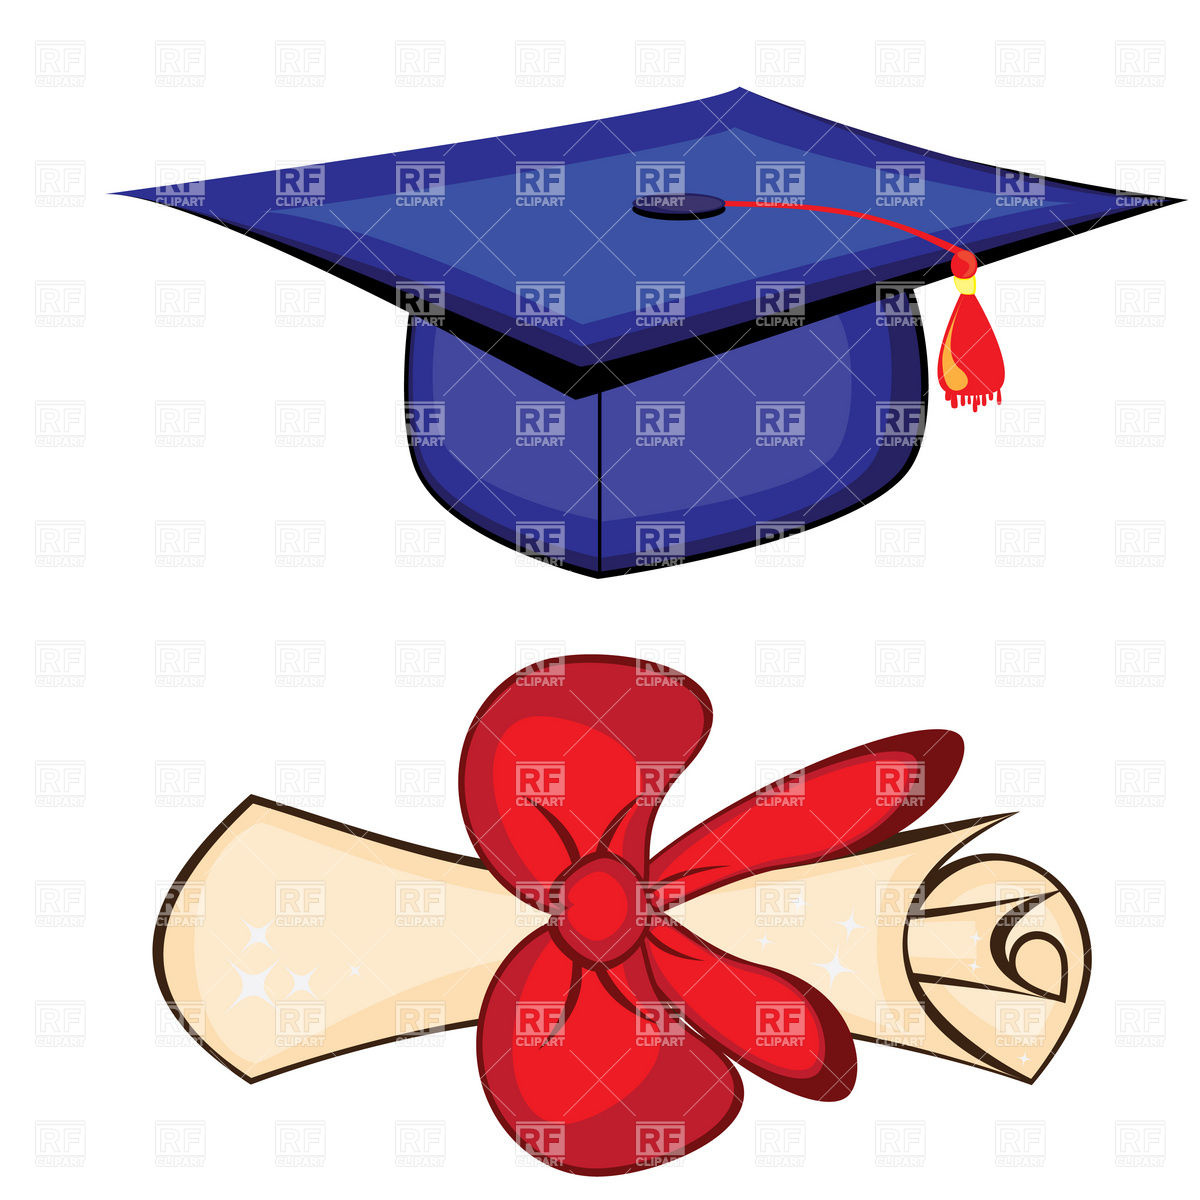 1200x1200 Diploma And Graduation Cap Royalty Free Vector Clip Art Image